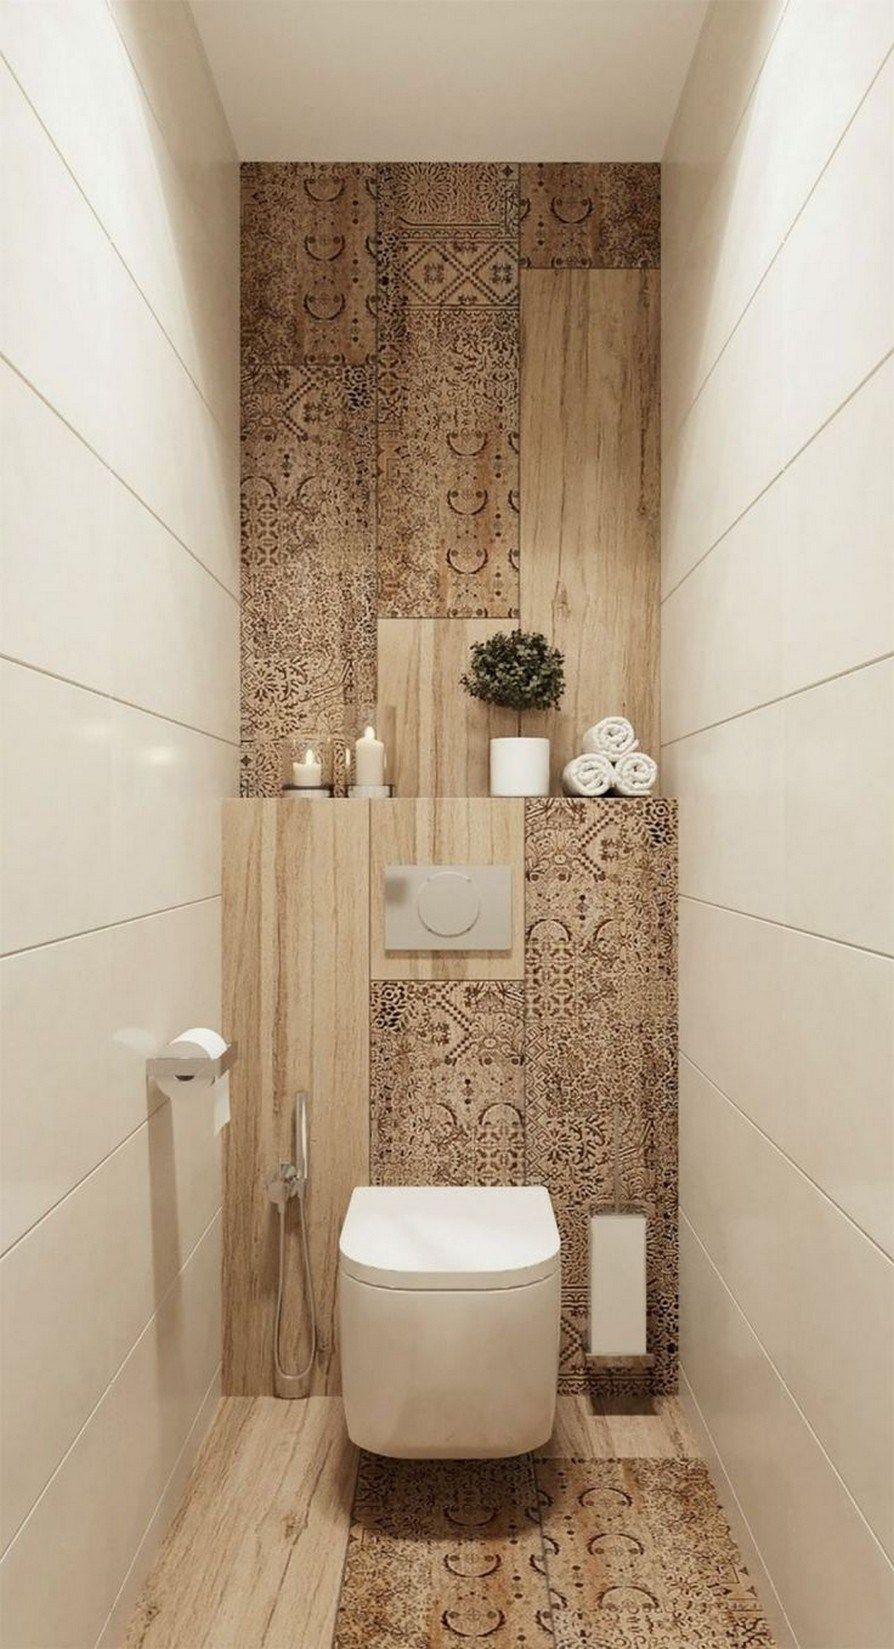 34 Stunning Small Bathroom Makeover Ideas Home Decor In 2020 Small Bathroom Makeover Toilet Room Decor Bathroom Design Small